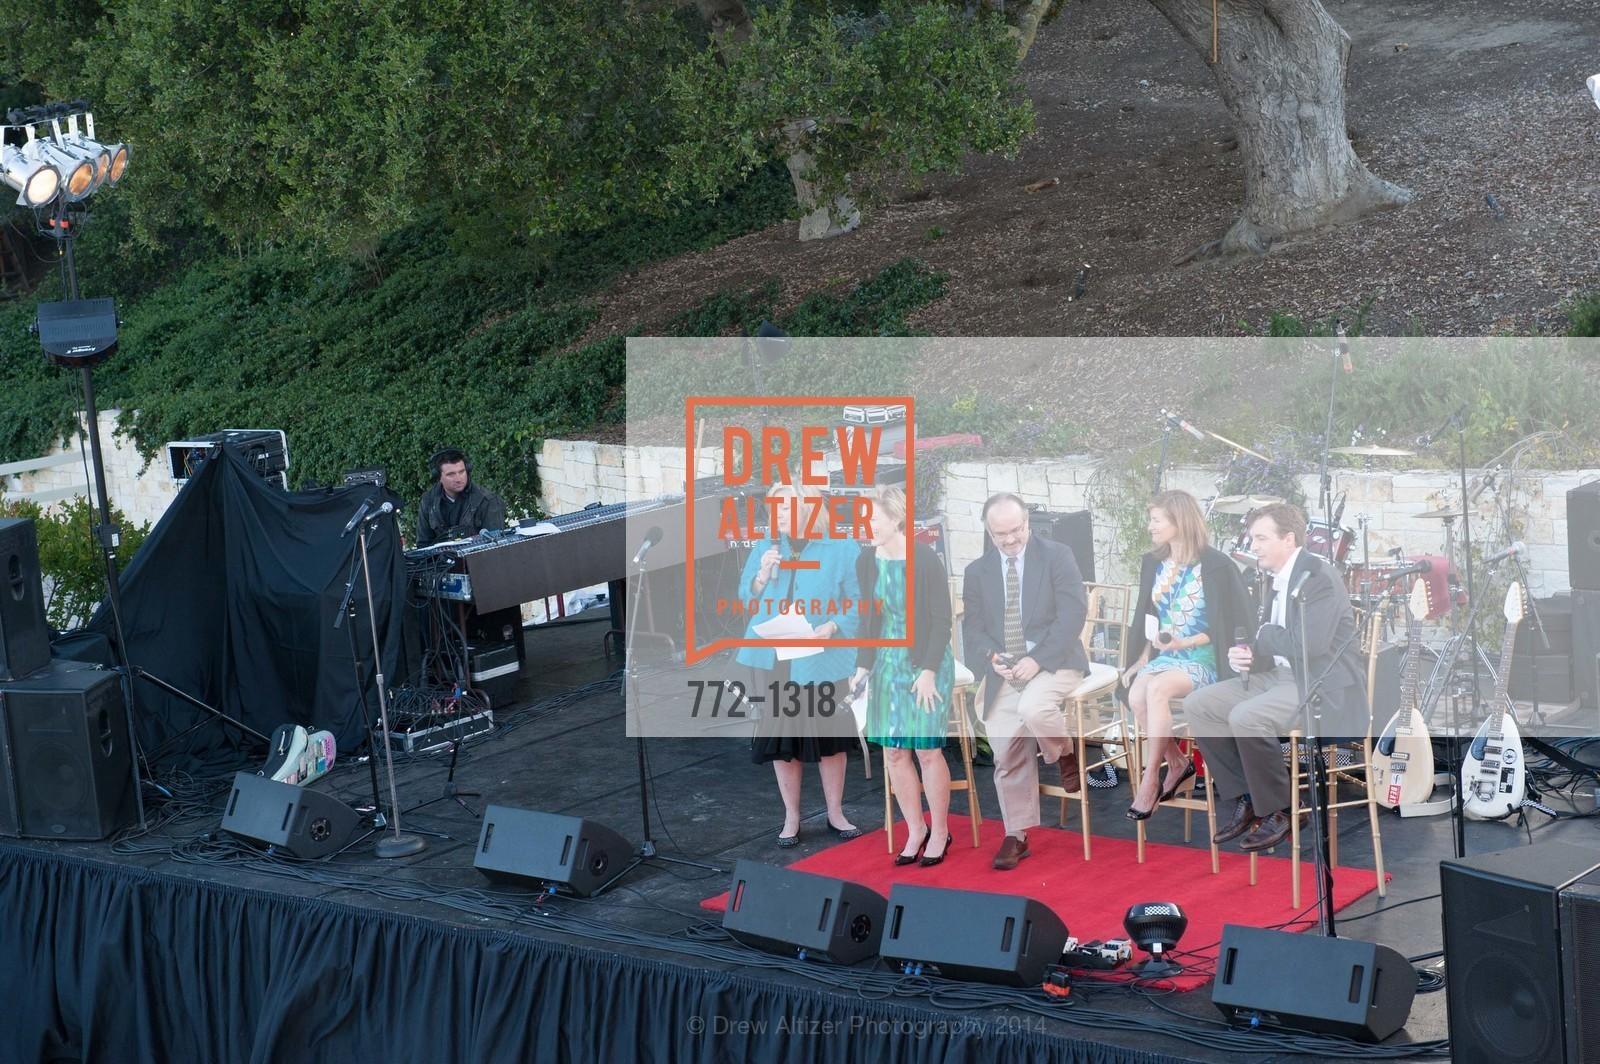 Rita Williams, Wendy Adams, John Aucott, Carin Rollins, William Robinson, Bay Area Lyme Foundation's LymeAid 2014, 884 Portola Road, Suite A7. Portola Valley, CA 94028, April 27th, 2014